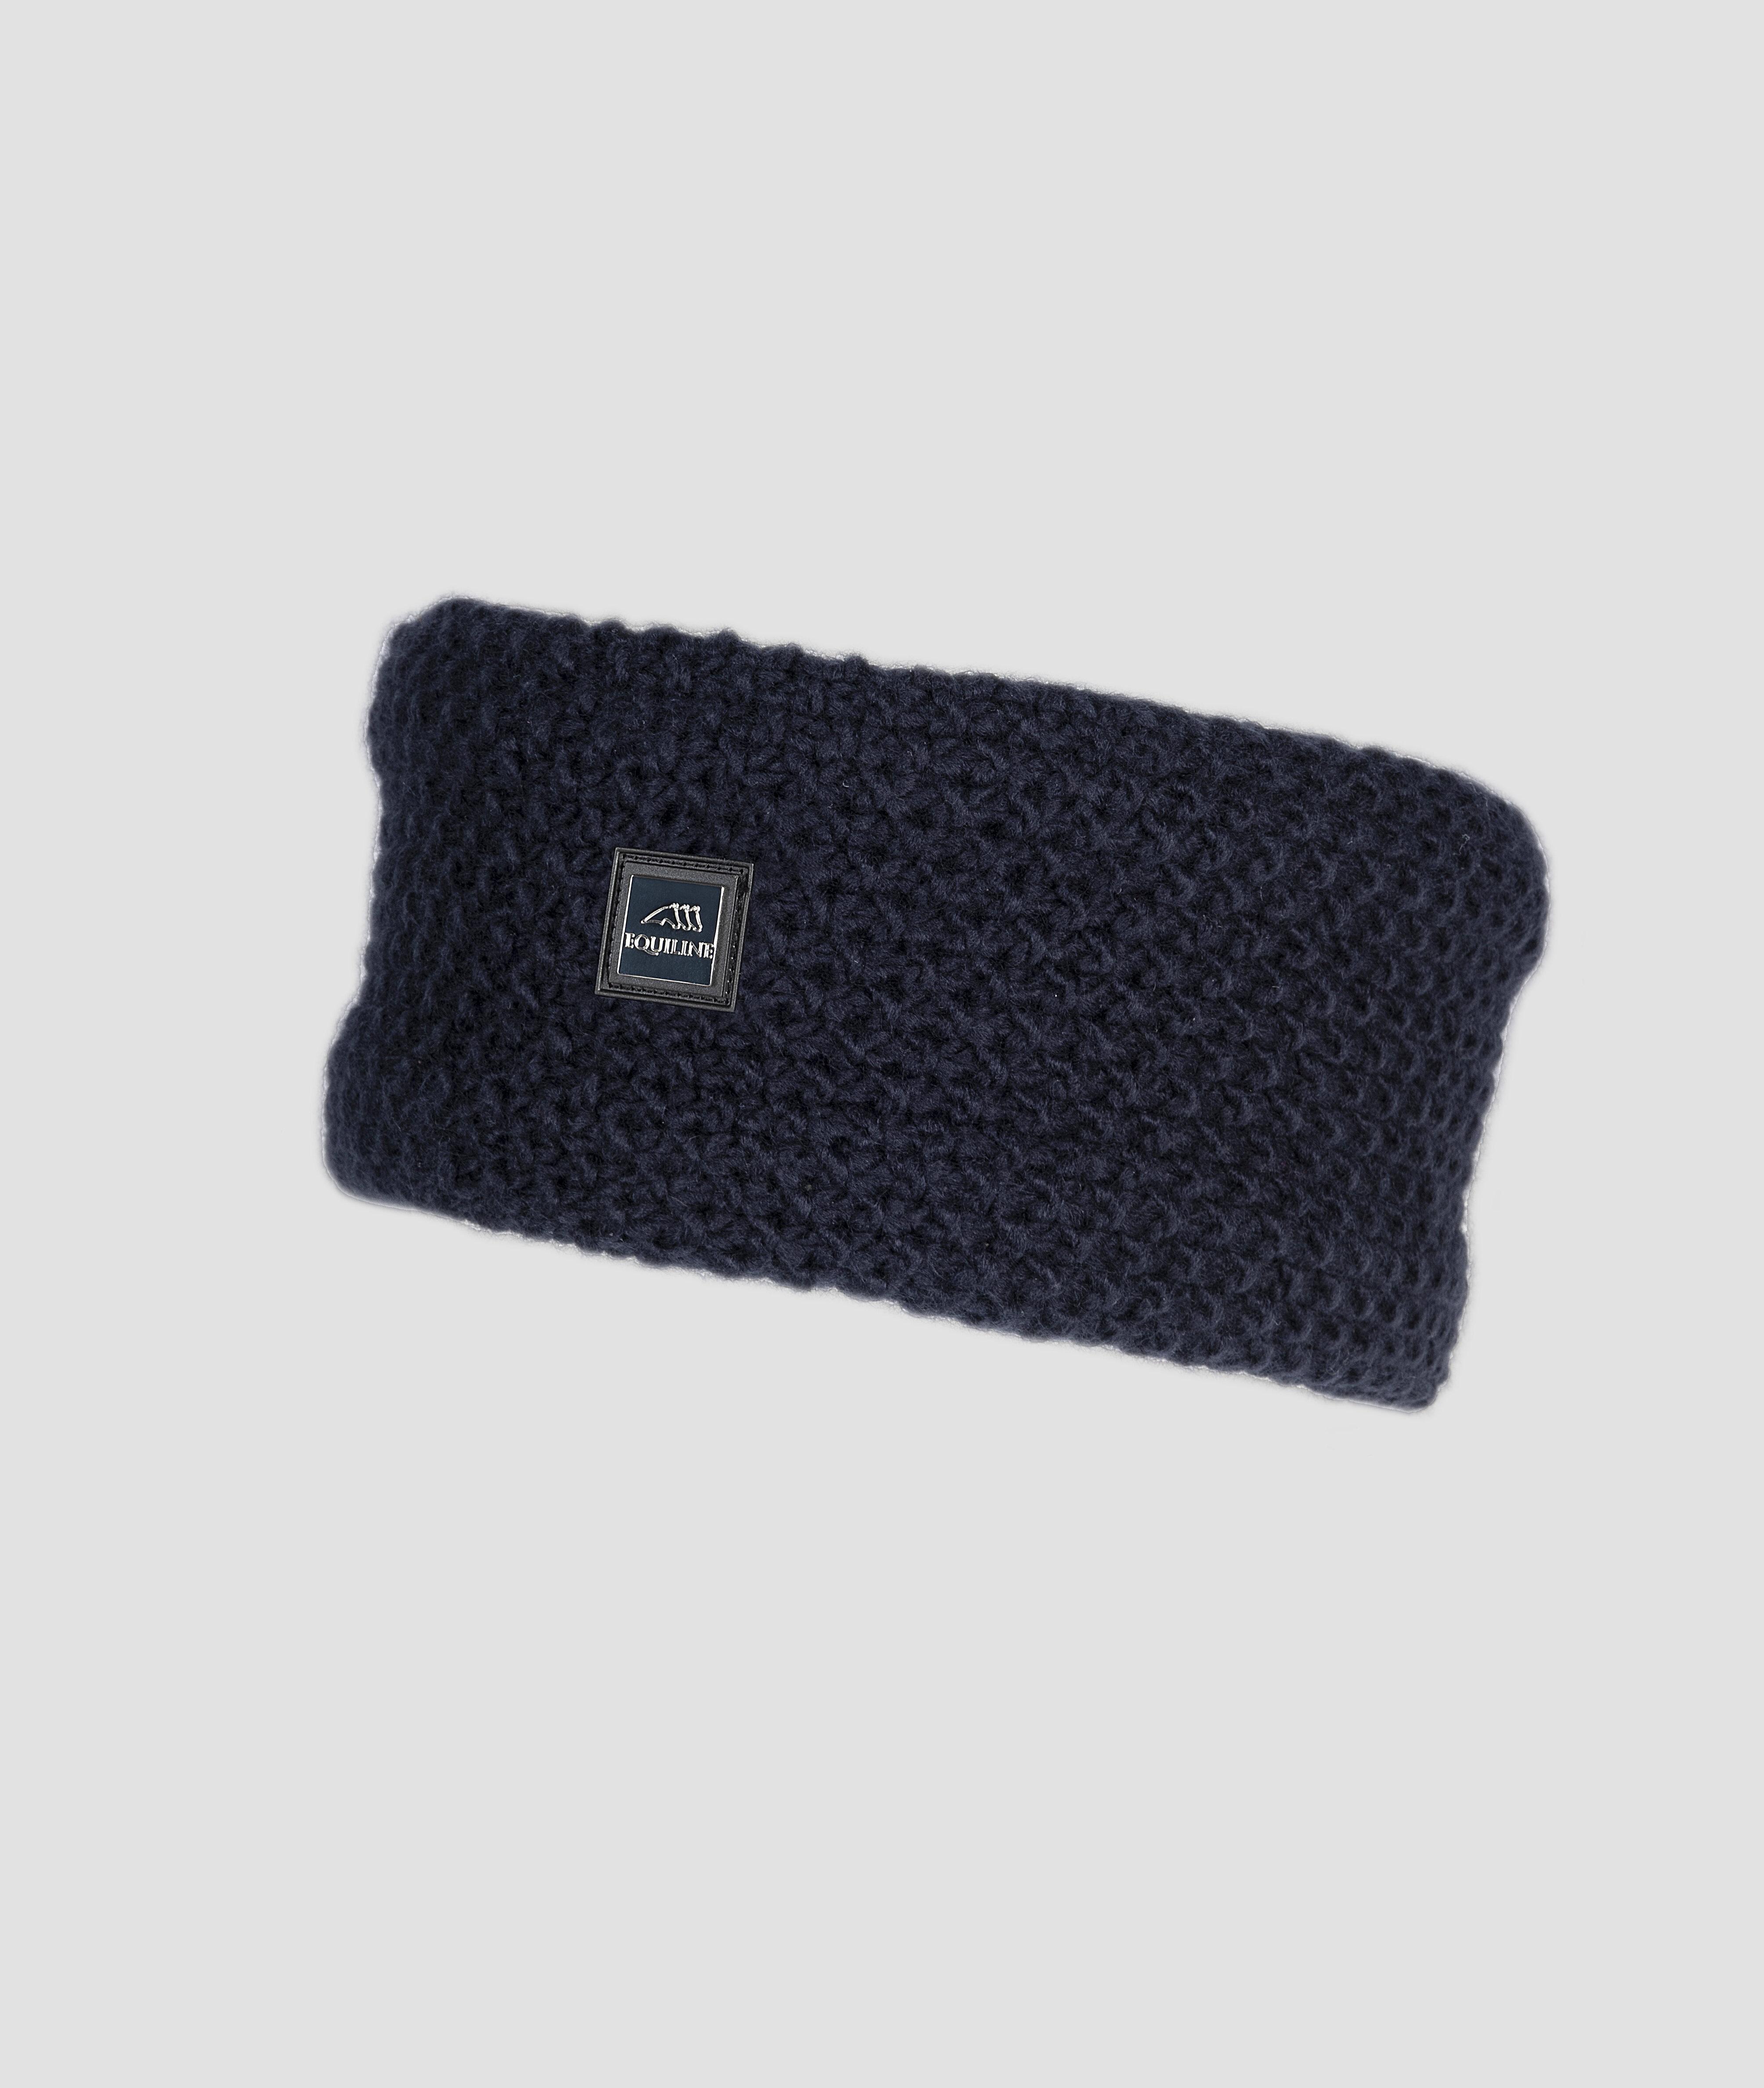 Celac Headband - Navy